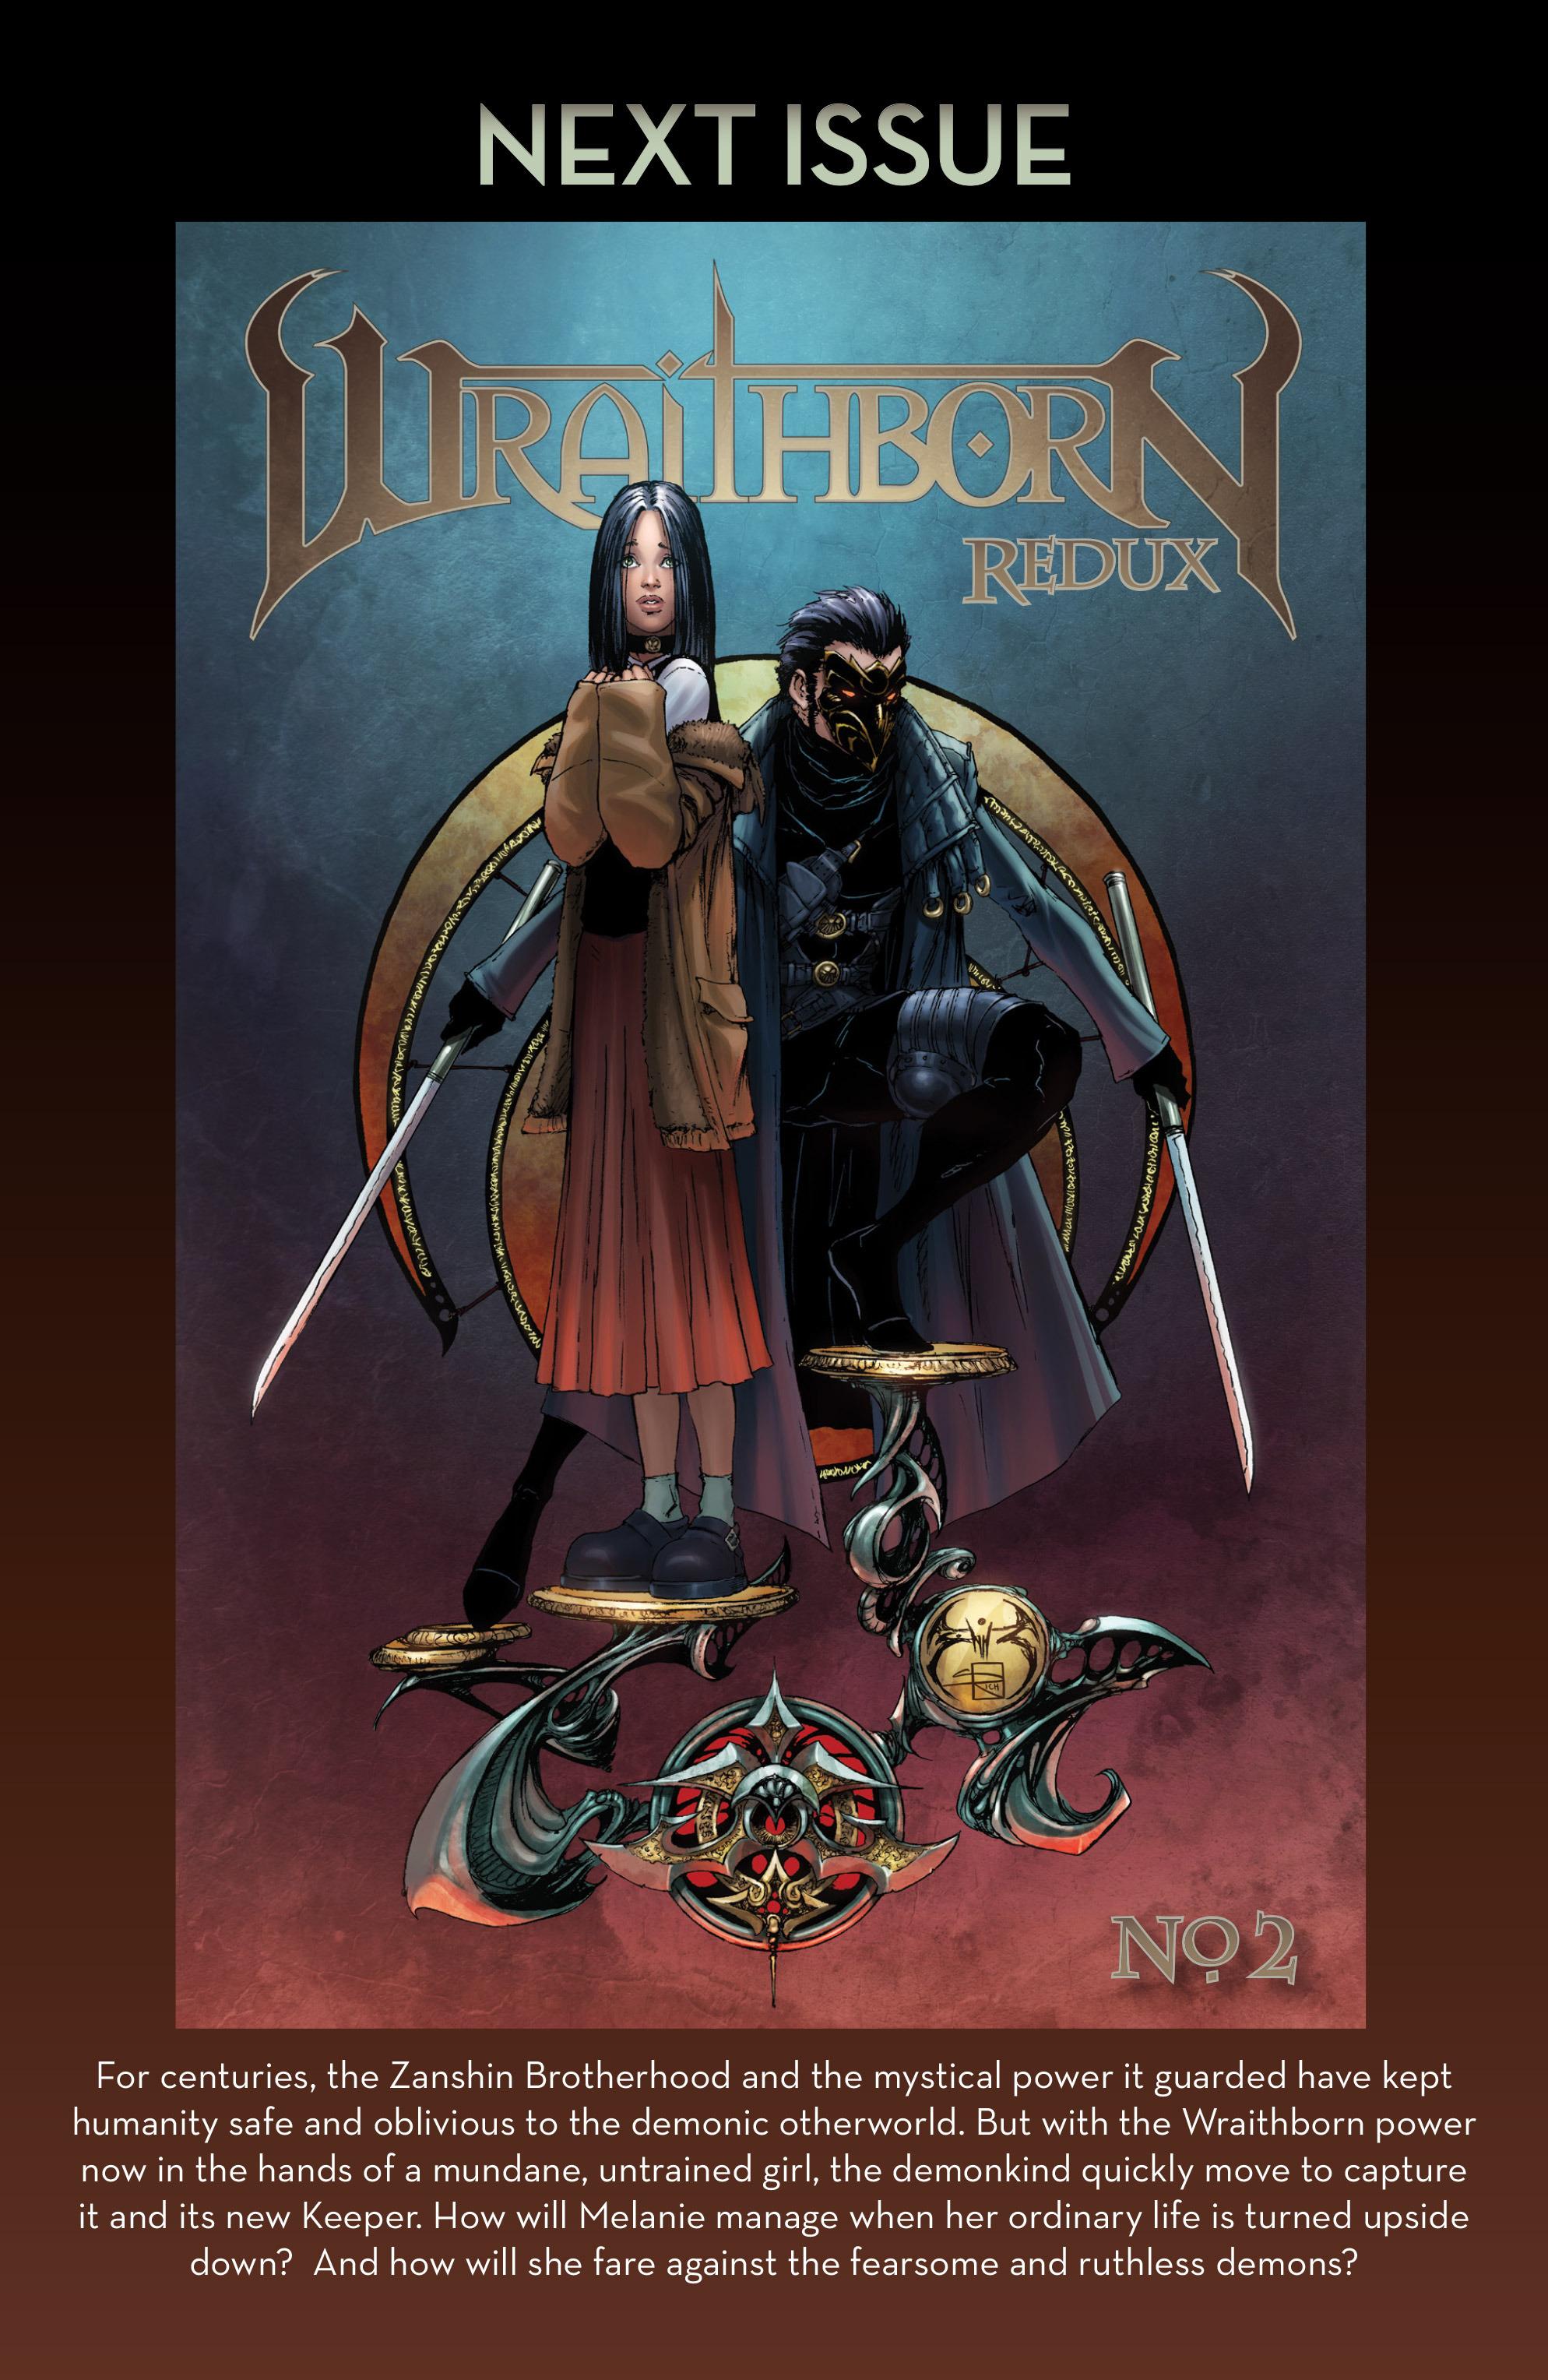 Read online Wraithborn Redux comic -  Issue #1 - 29